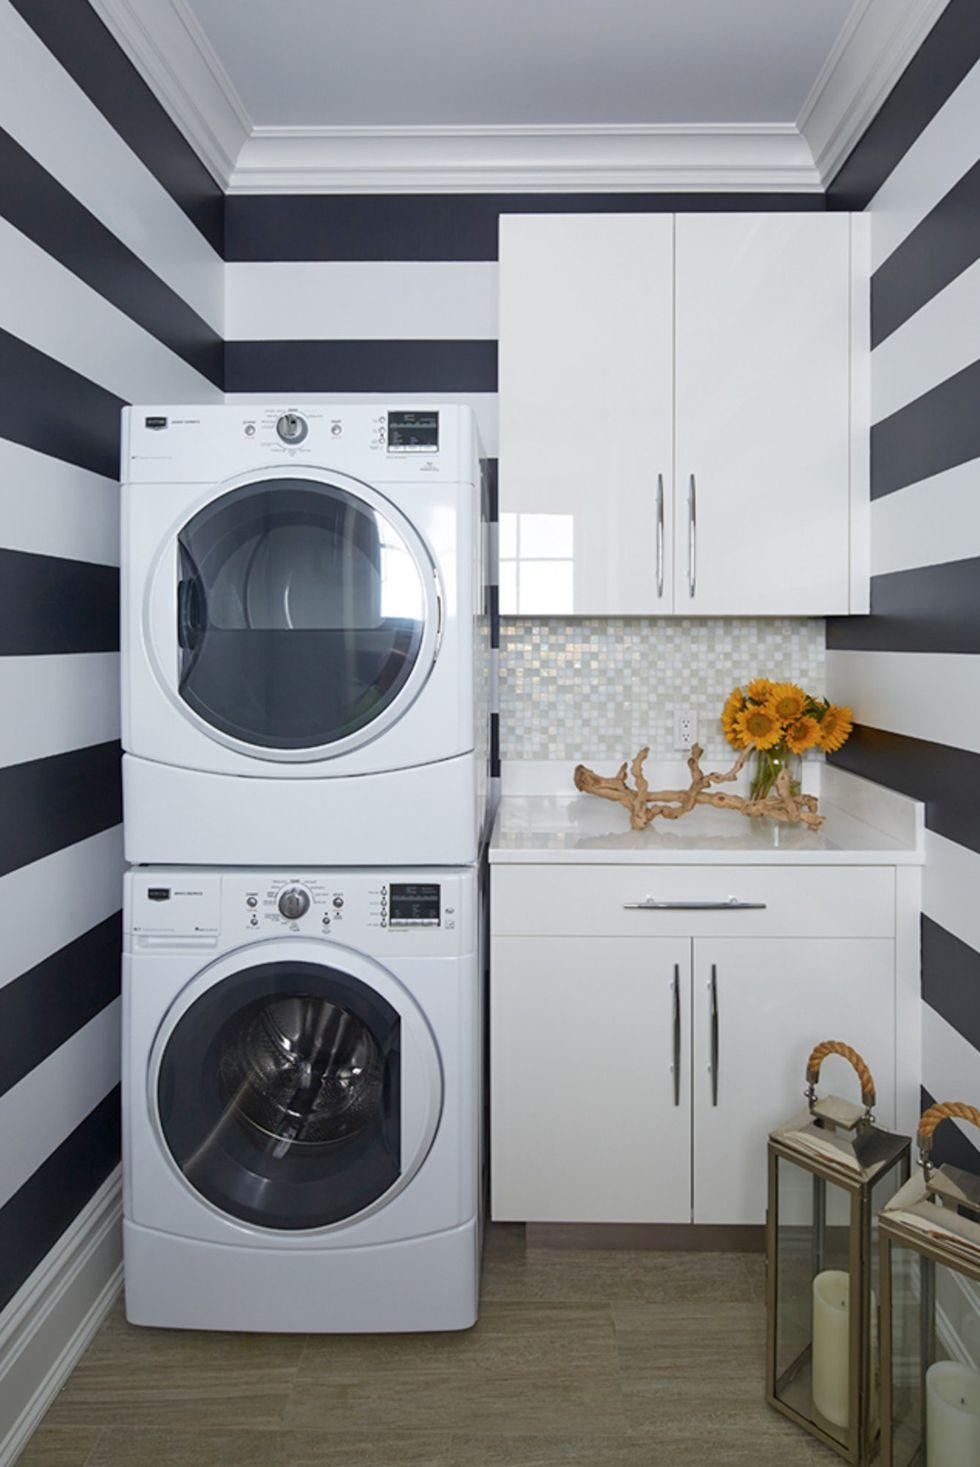 Laundry-room-6-1556118414